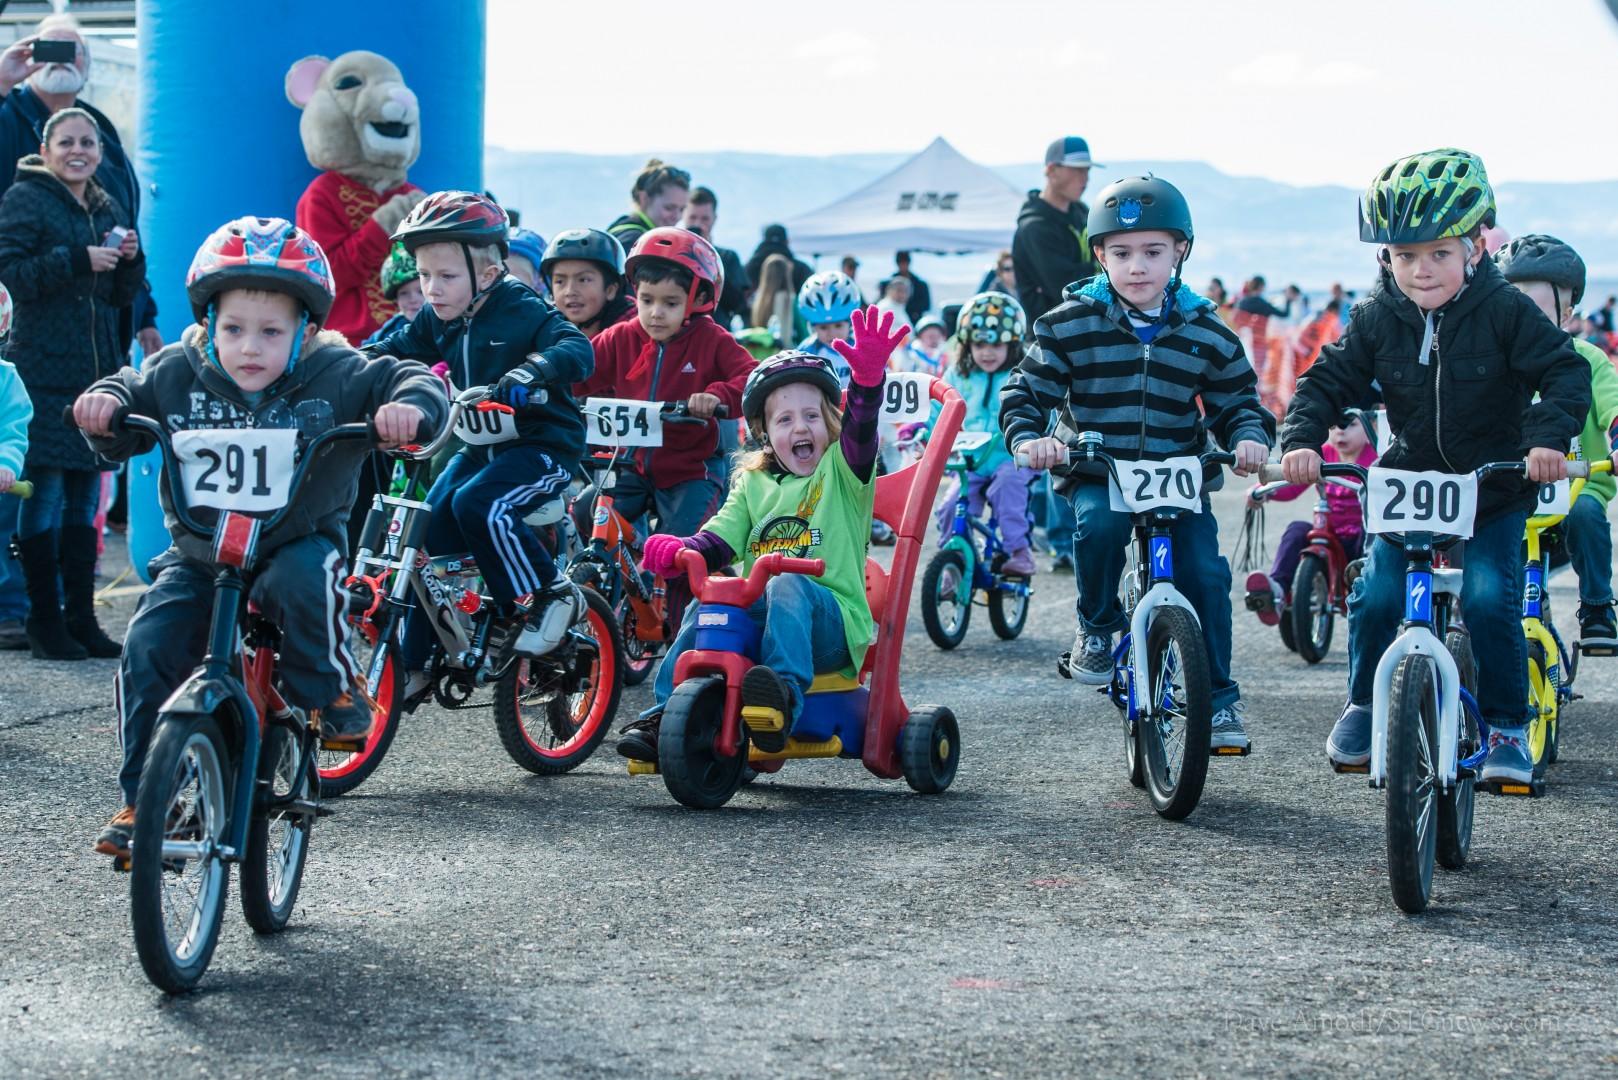 Tuff Kids Criterion Race, St. George, Utah, Feb. 1, 2014 | Photo by Dave Amodt, St. George News